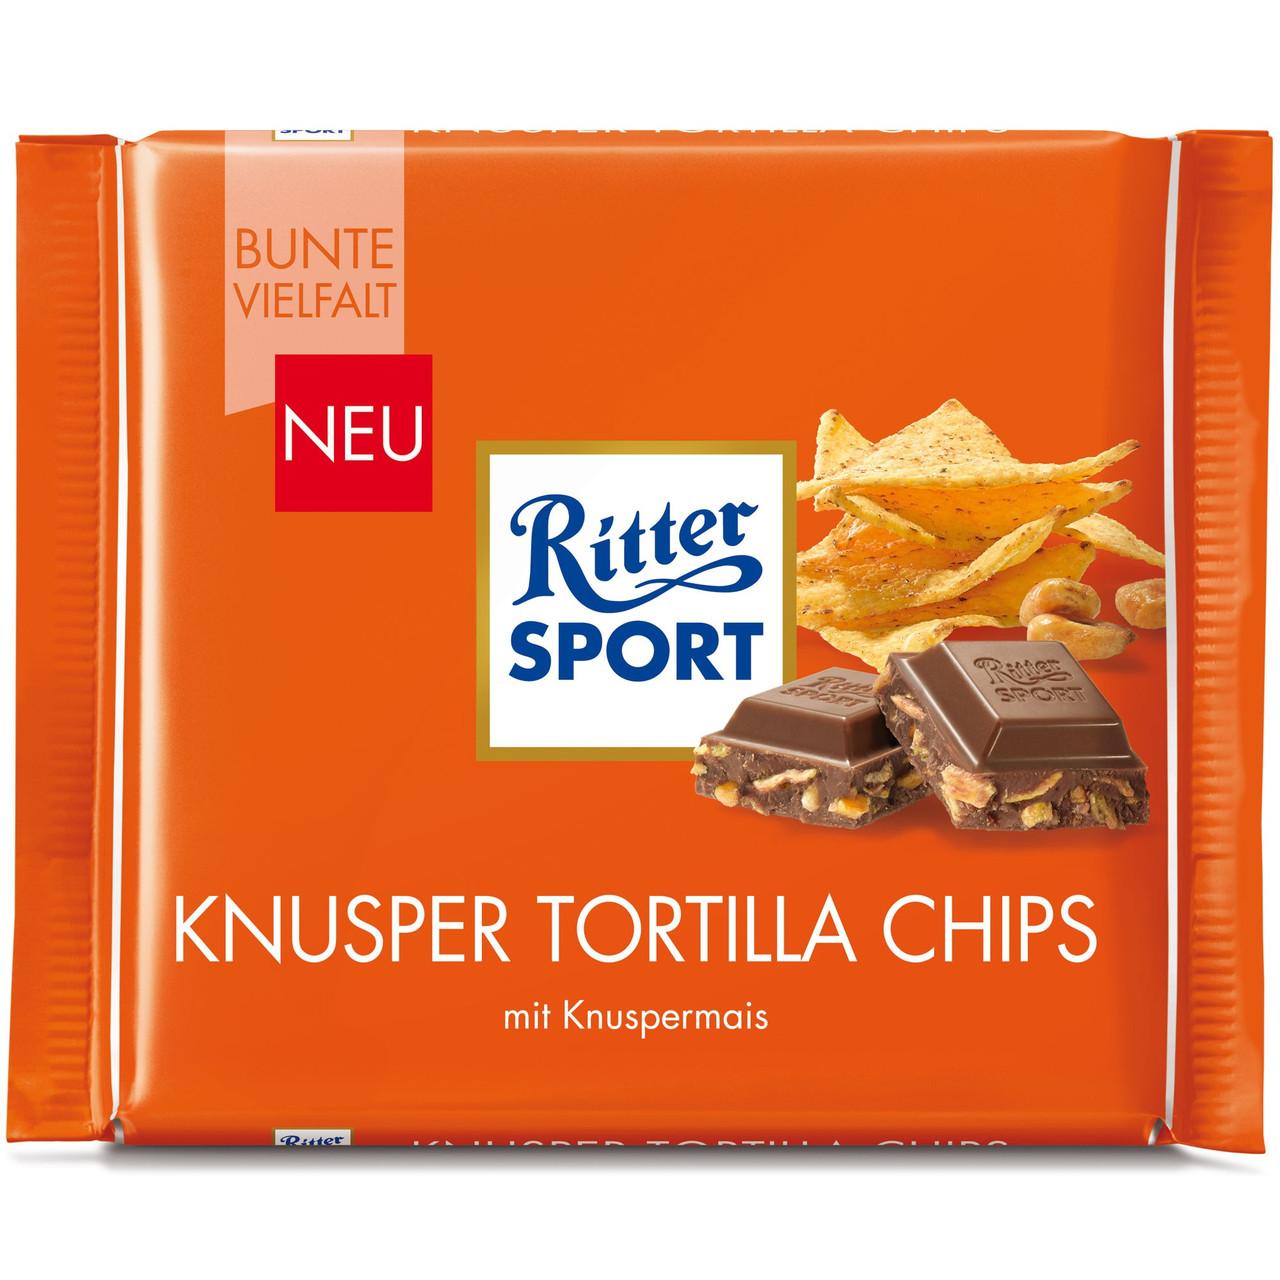 Шоколад Ritter Sport Knusper Tortilla Chips (Риттер Спорт с чипсами), 100 г